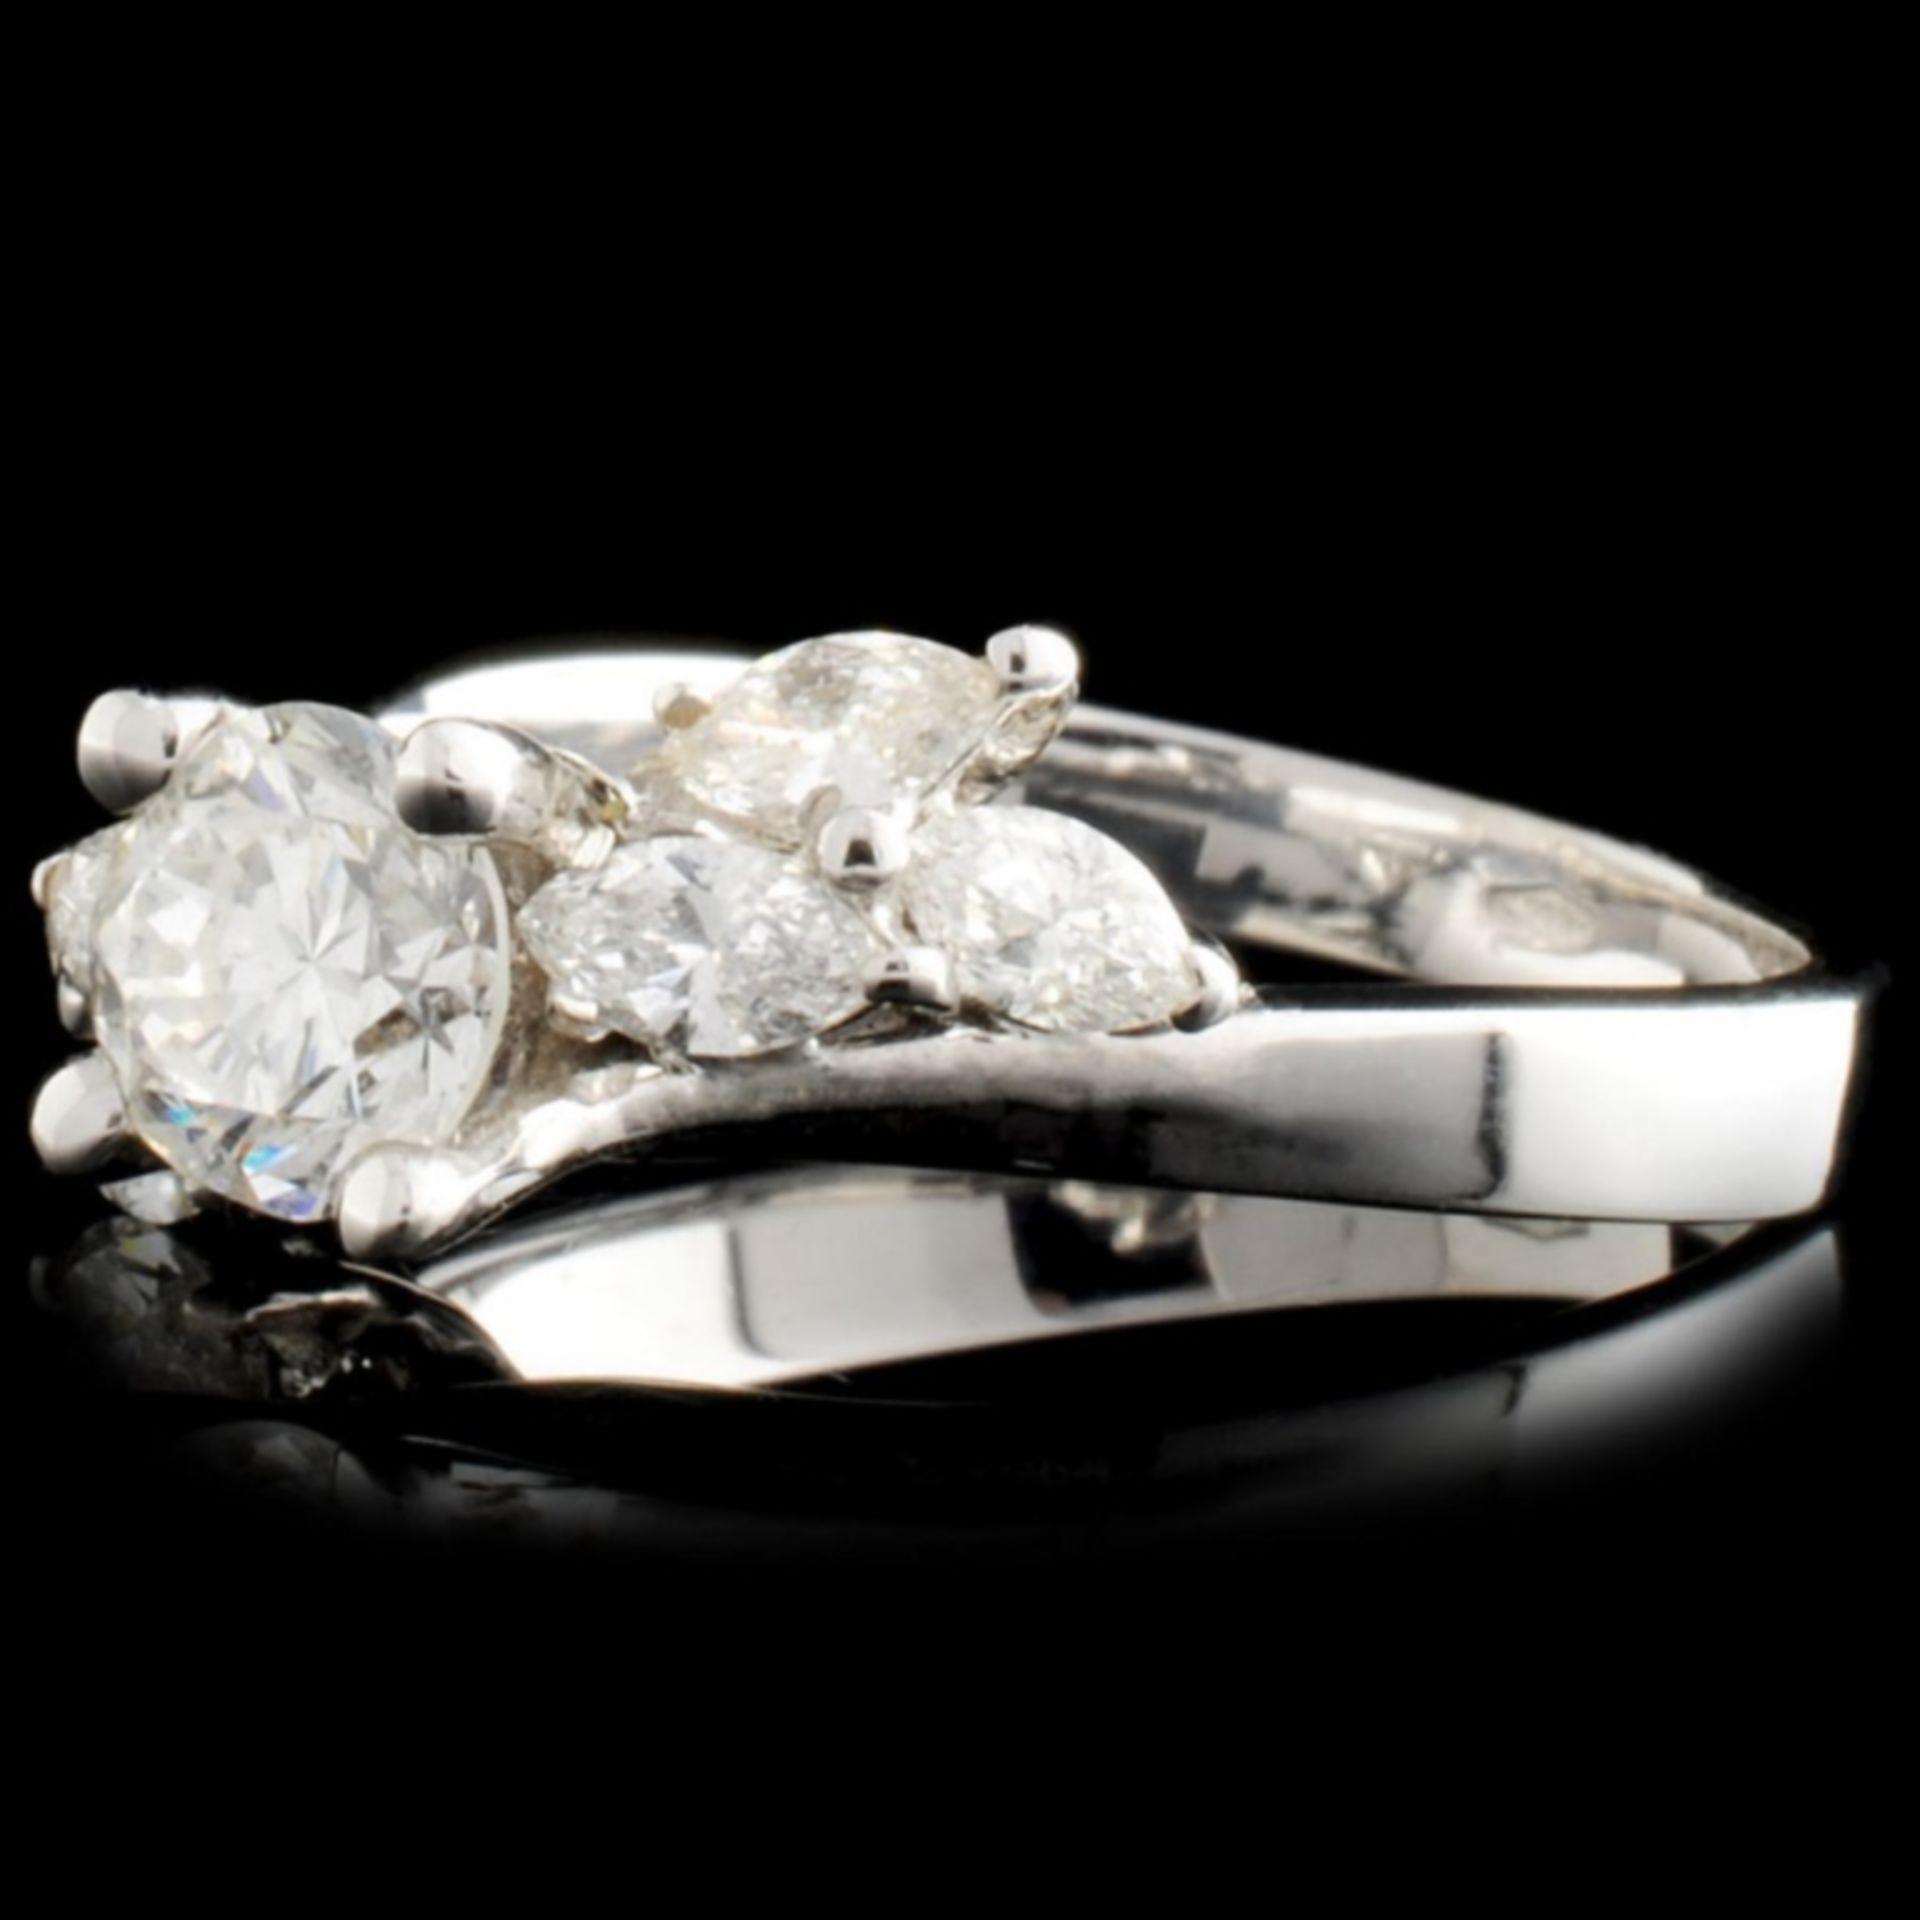 18K Gold 0.77ctw Diamond Ring - Image 2 of 3